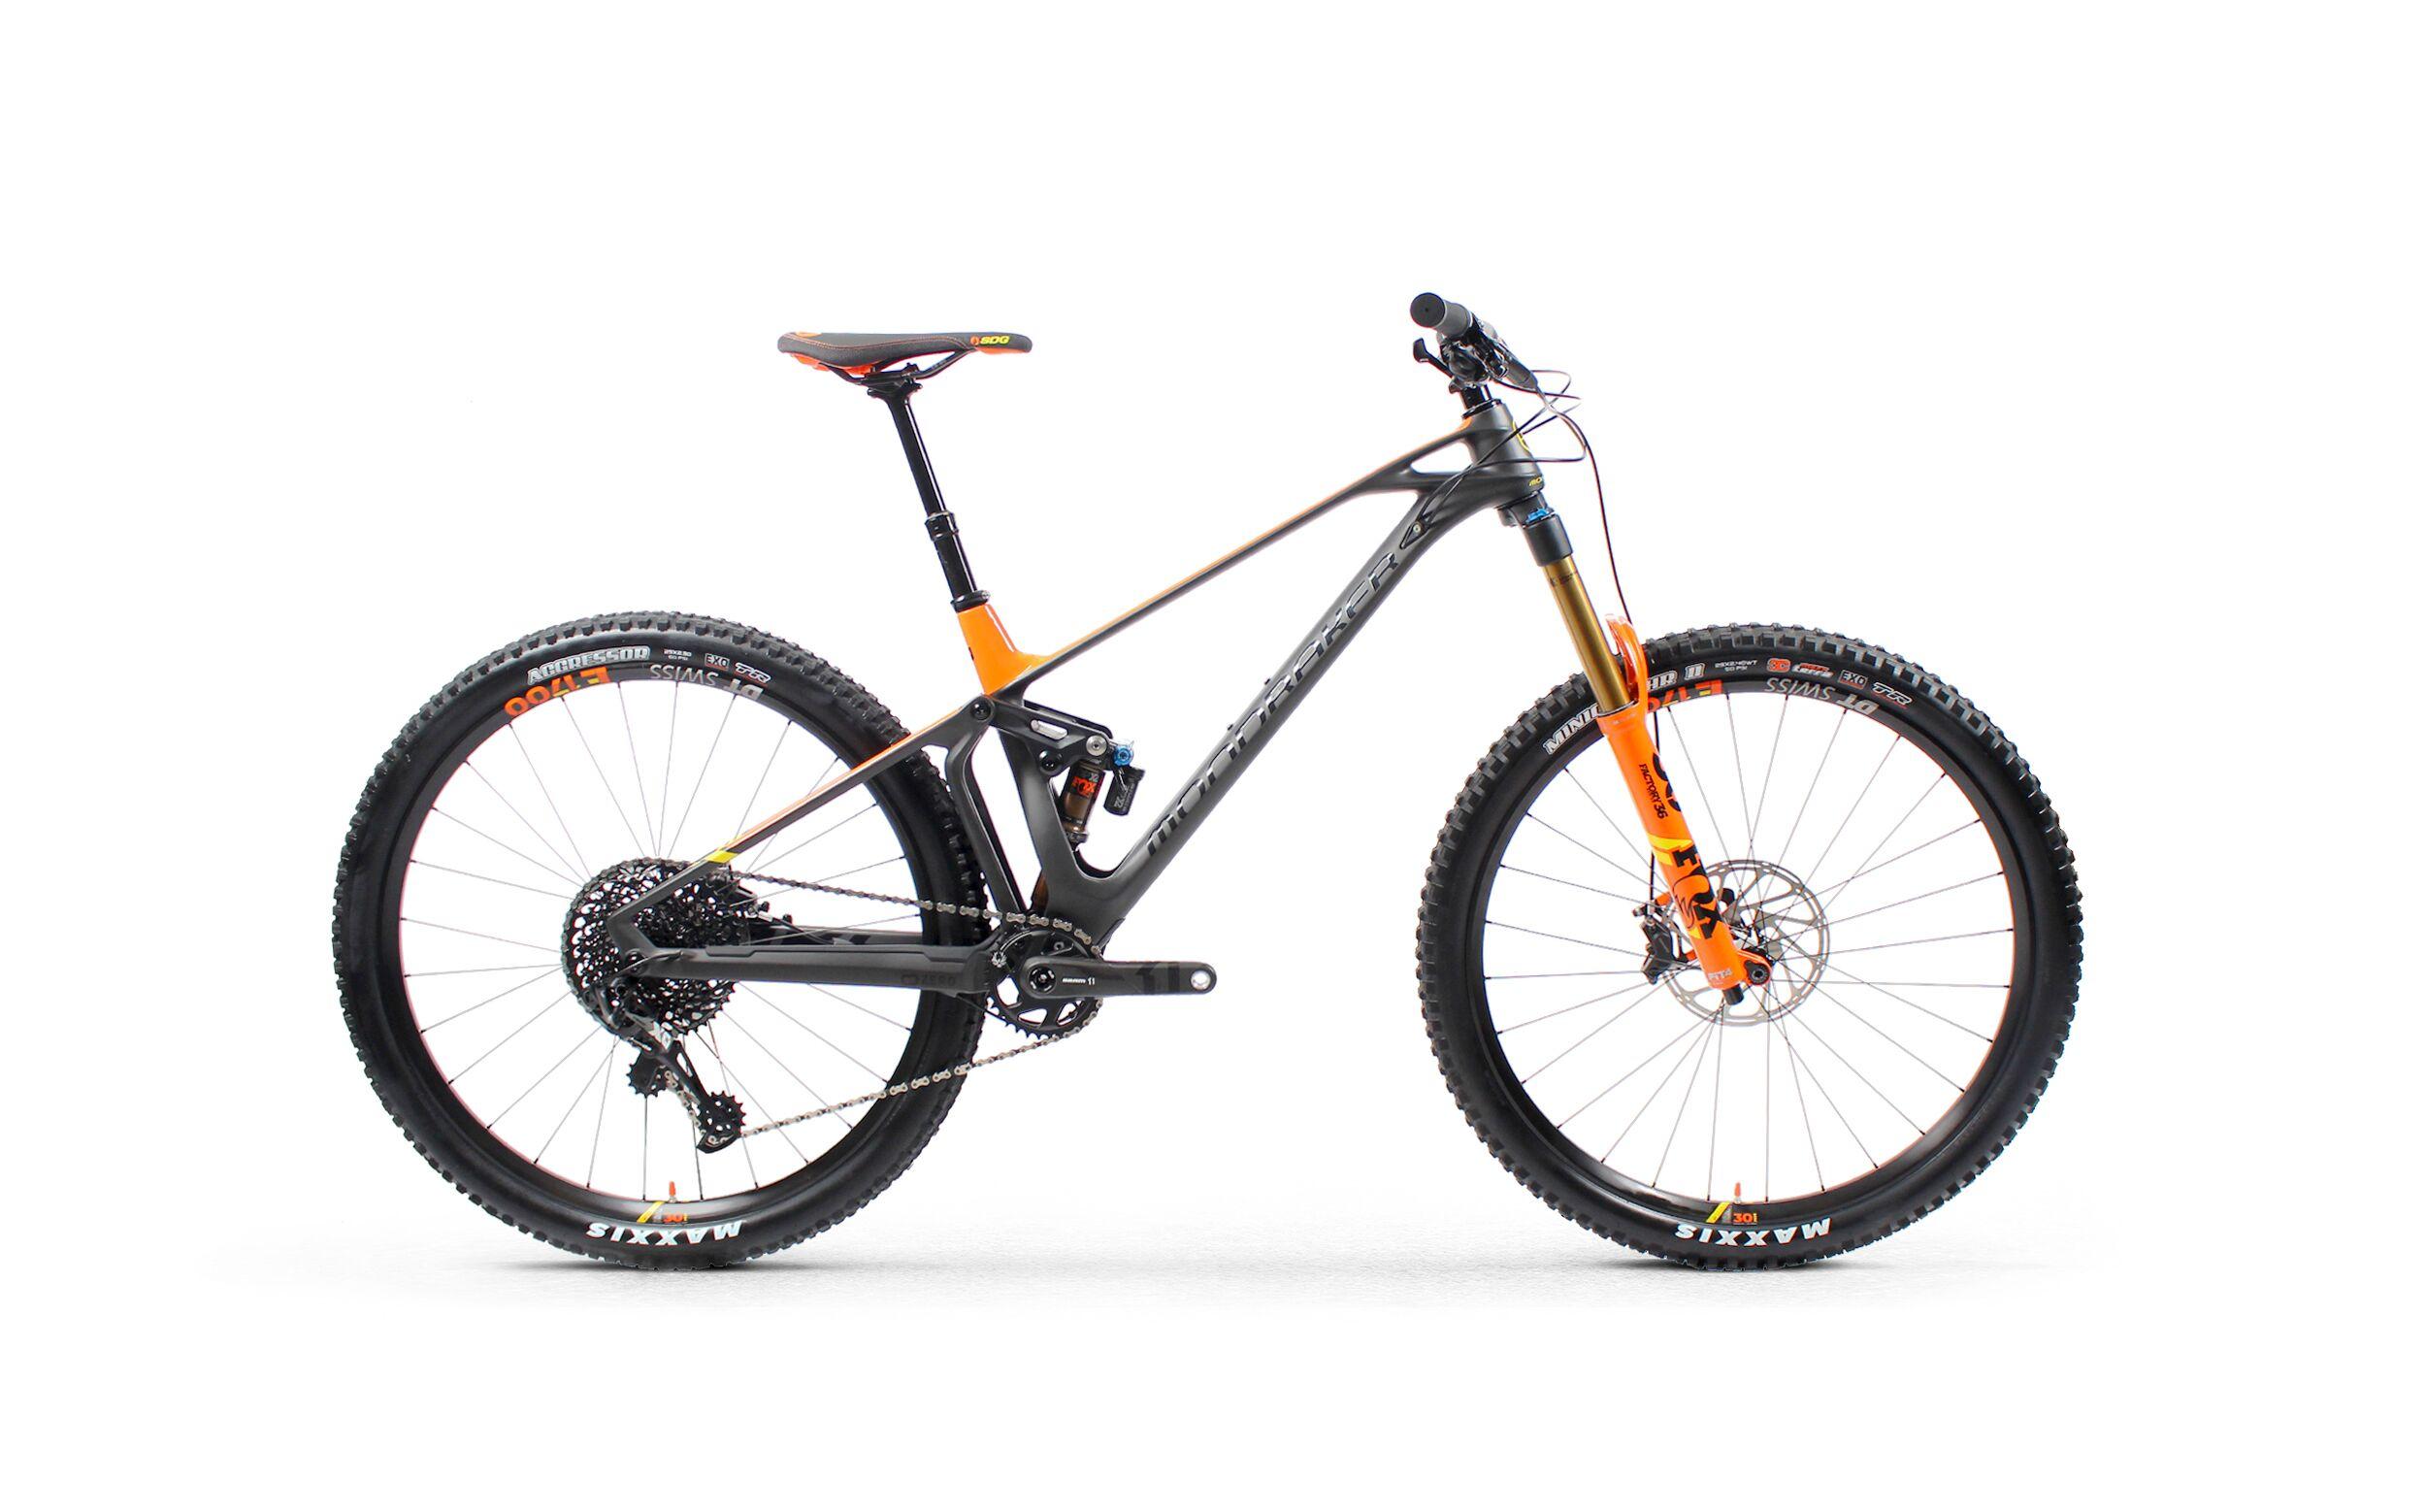 2019 Mondraker Foxy Carbon RR 29″ All Mountain/Enduro Bike – UK Only Spec  Bike